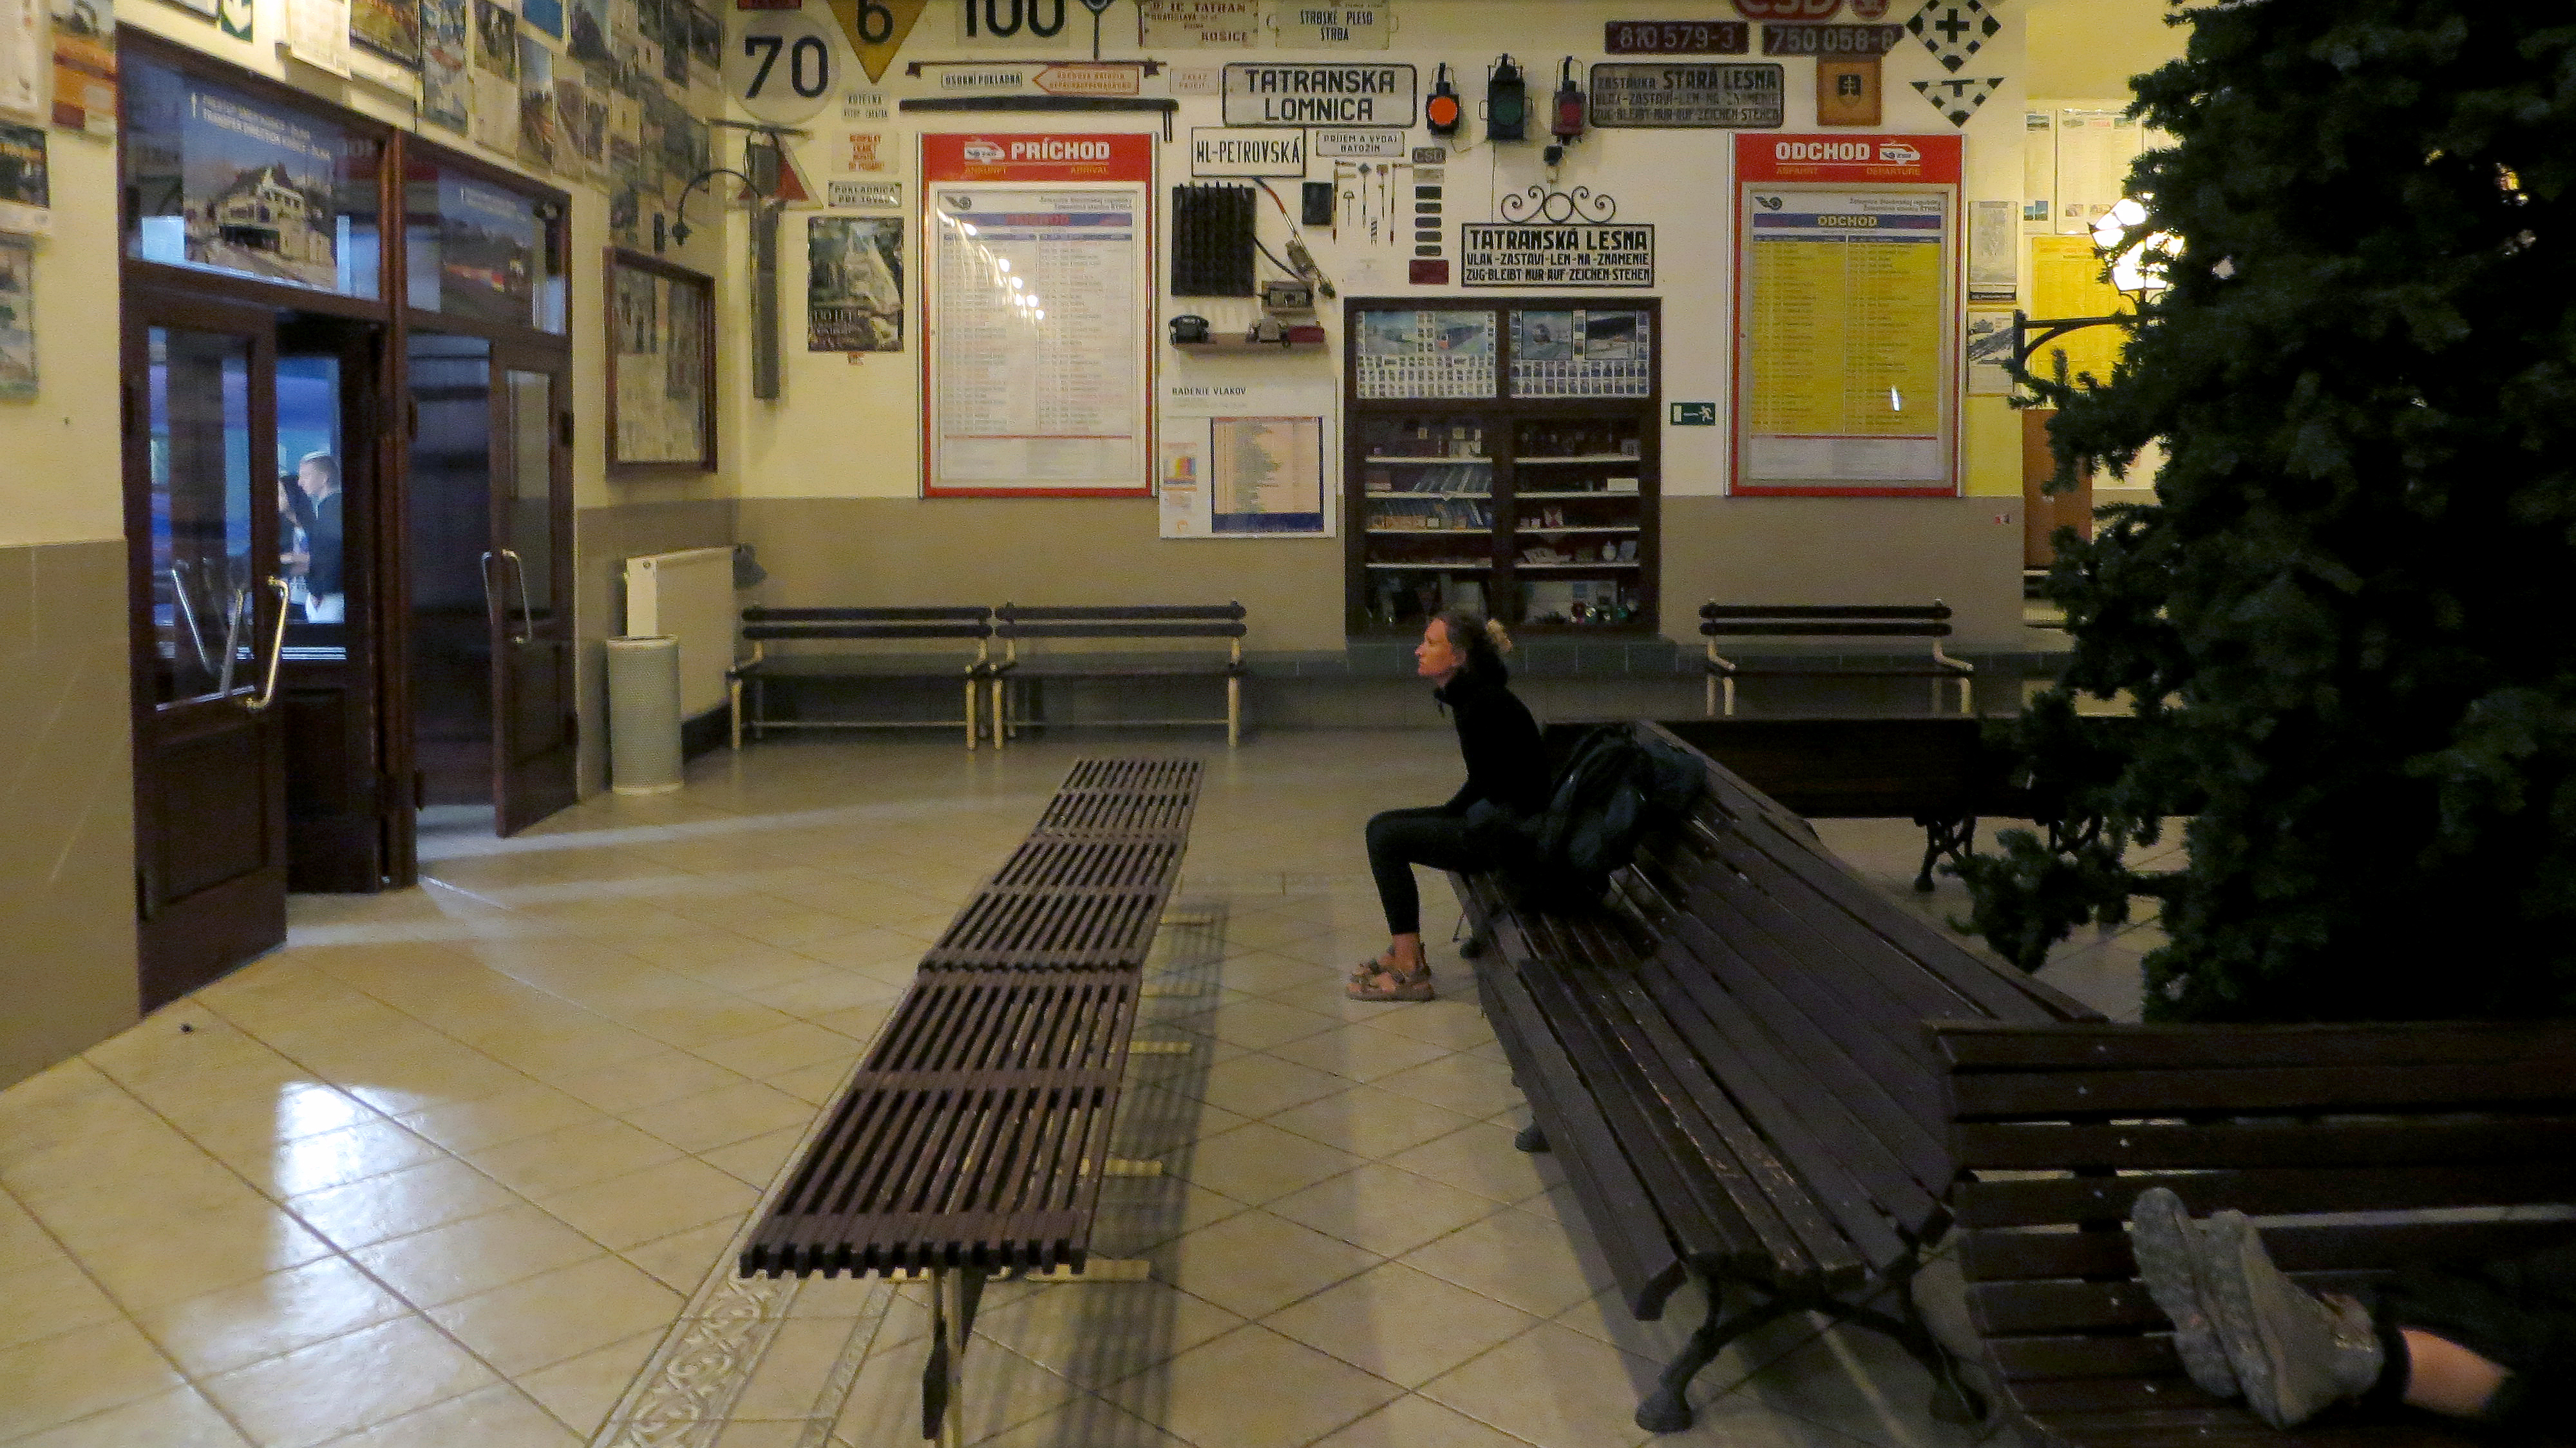 Trainstationspotting - Štrba train station, Slovakia, 2013